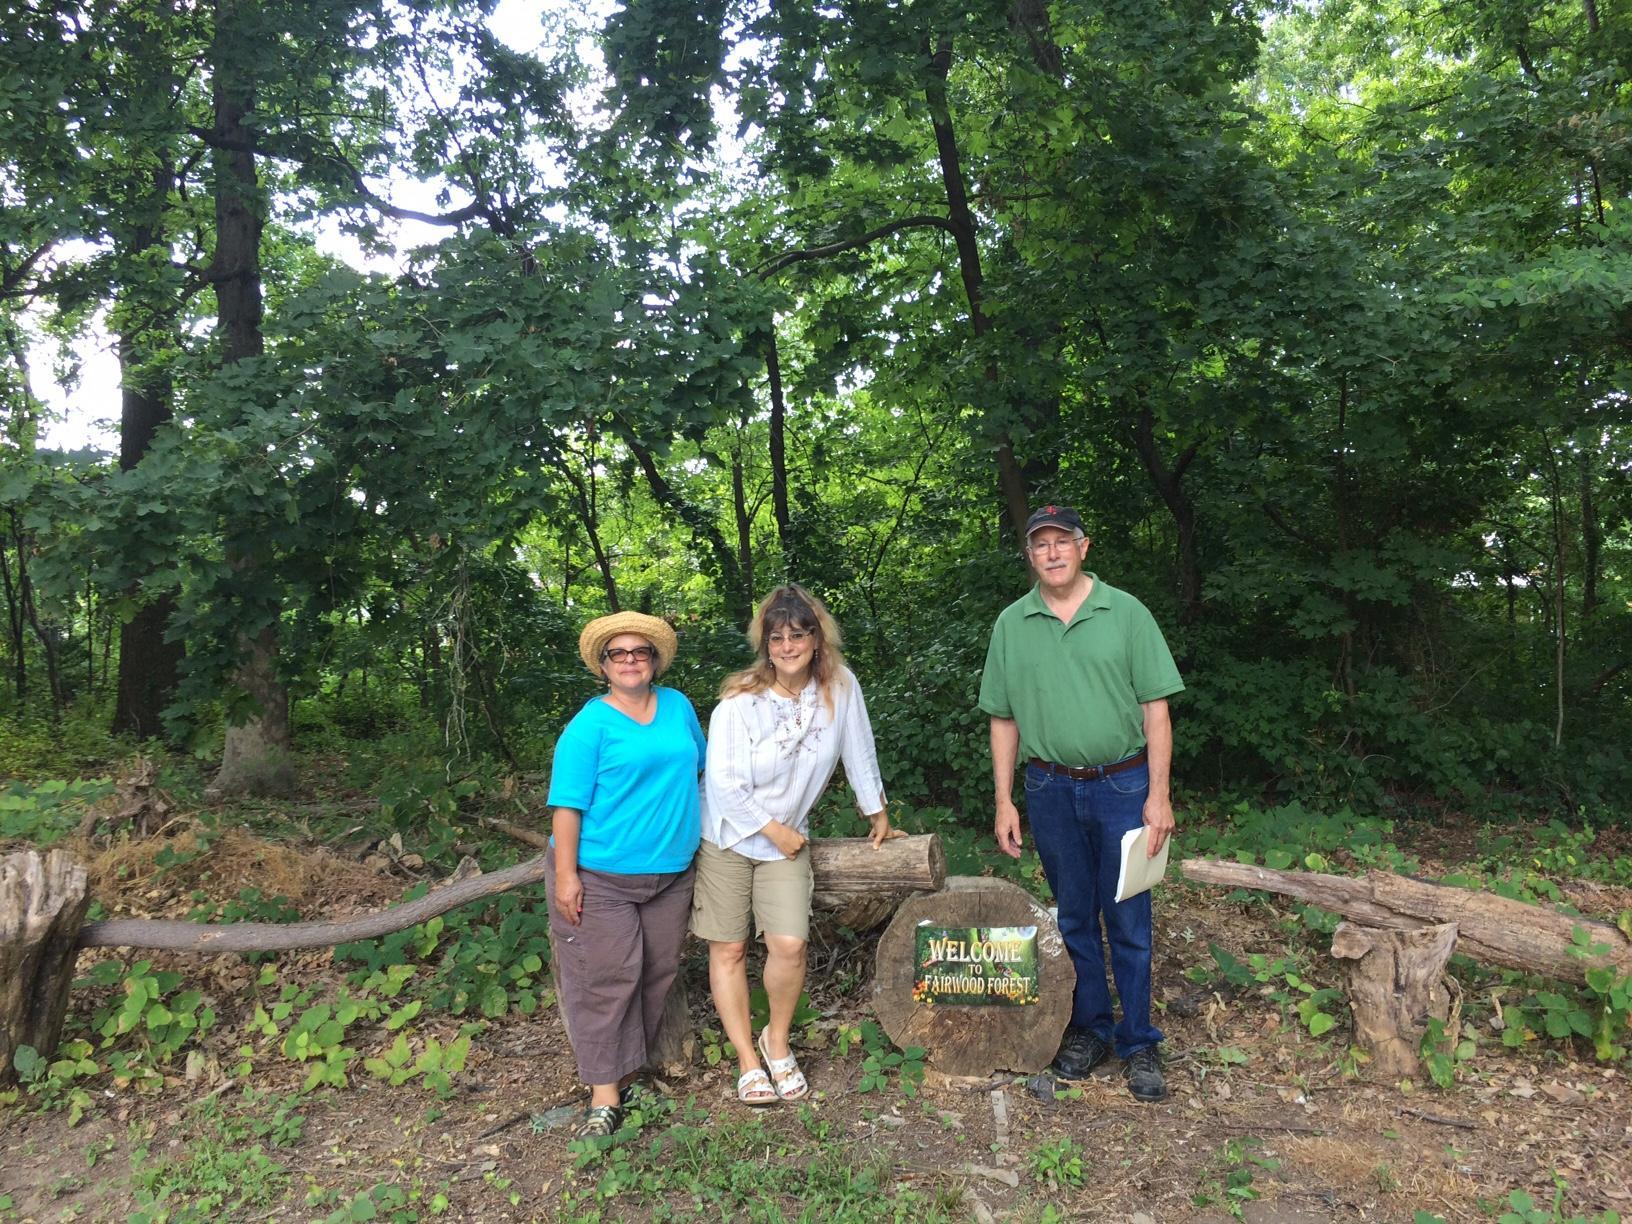 a neighborhood fights to preserve an urban forest wypr